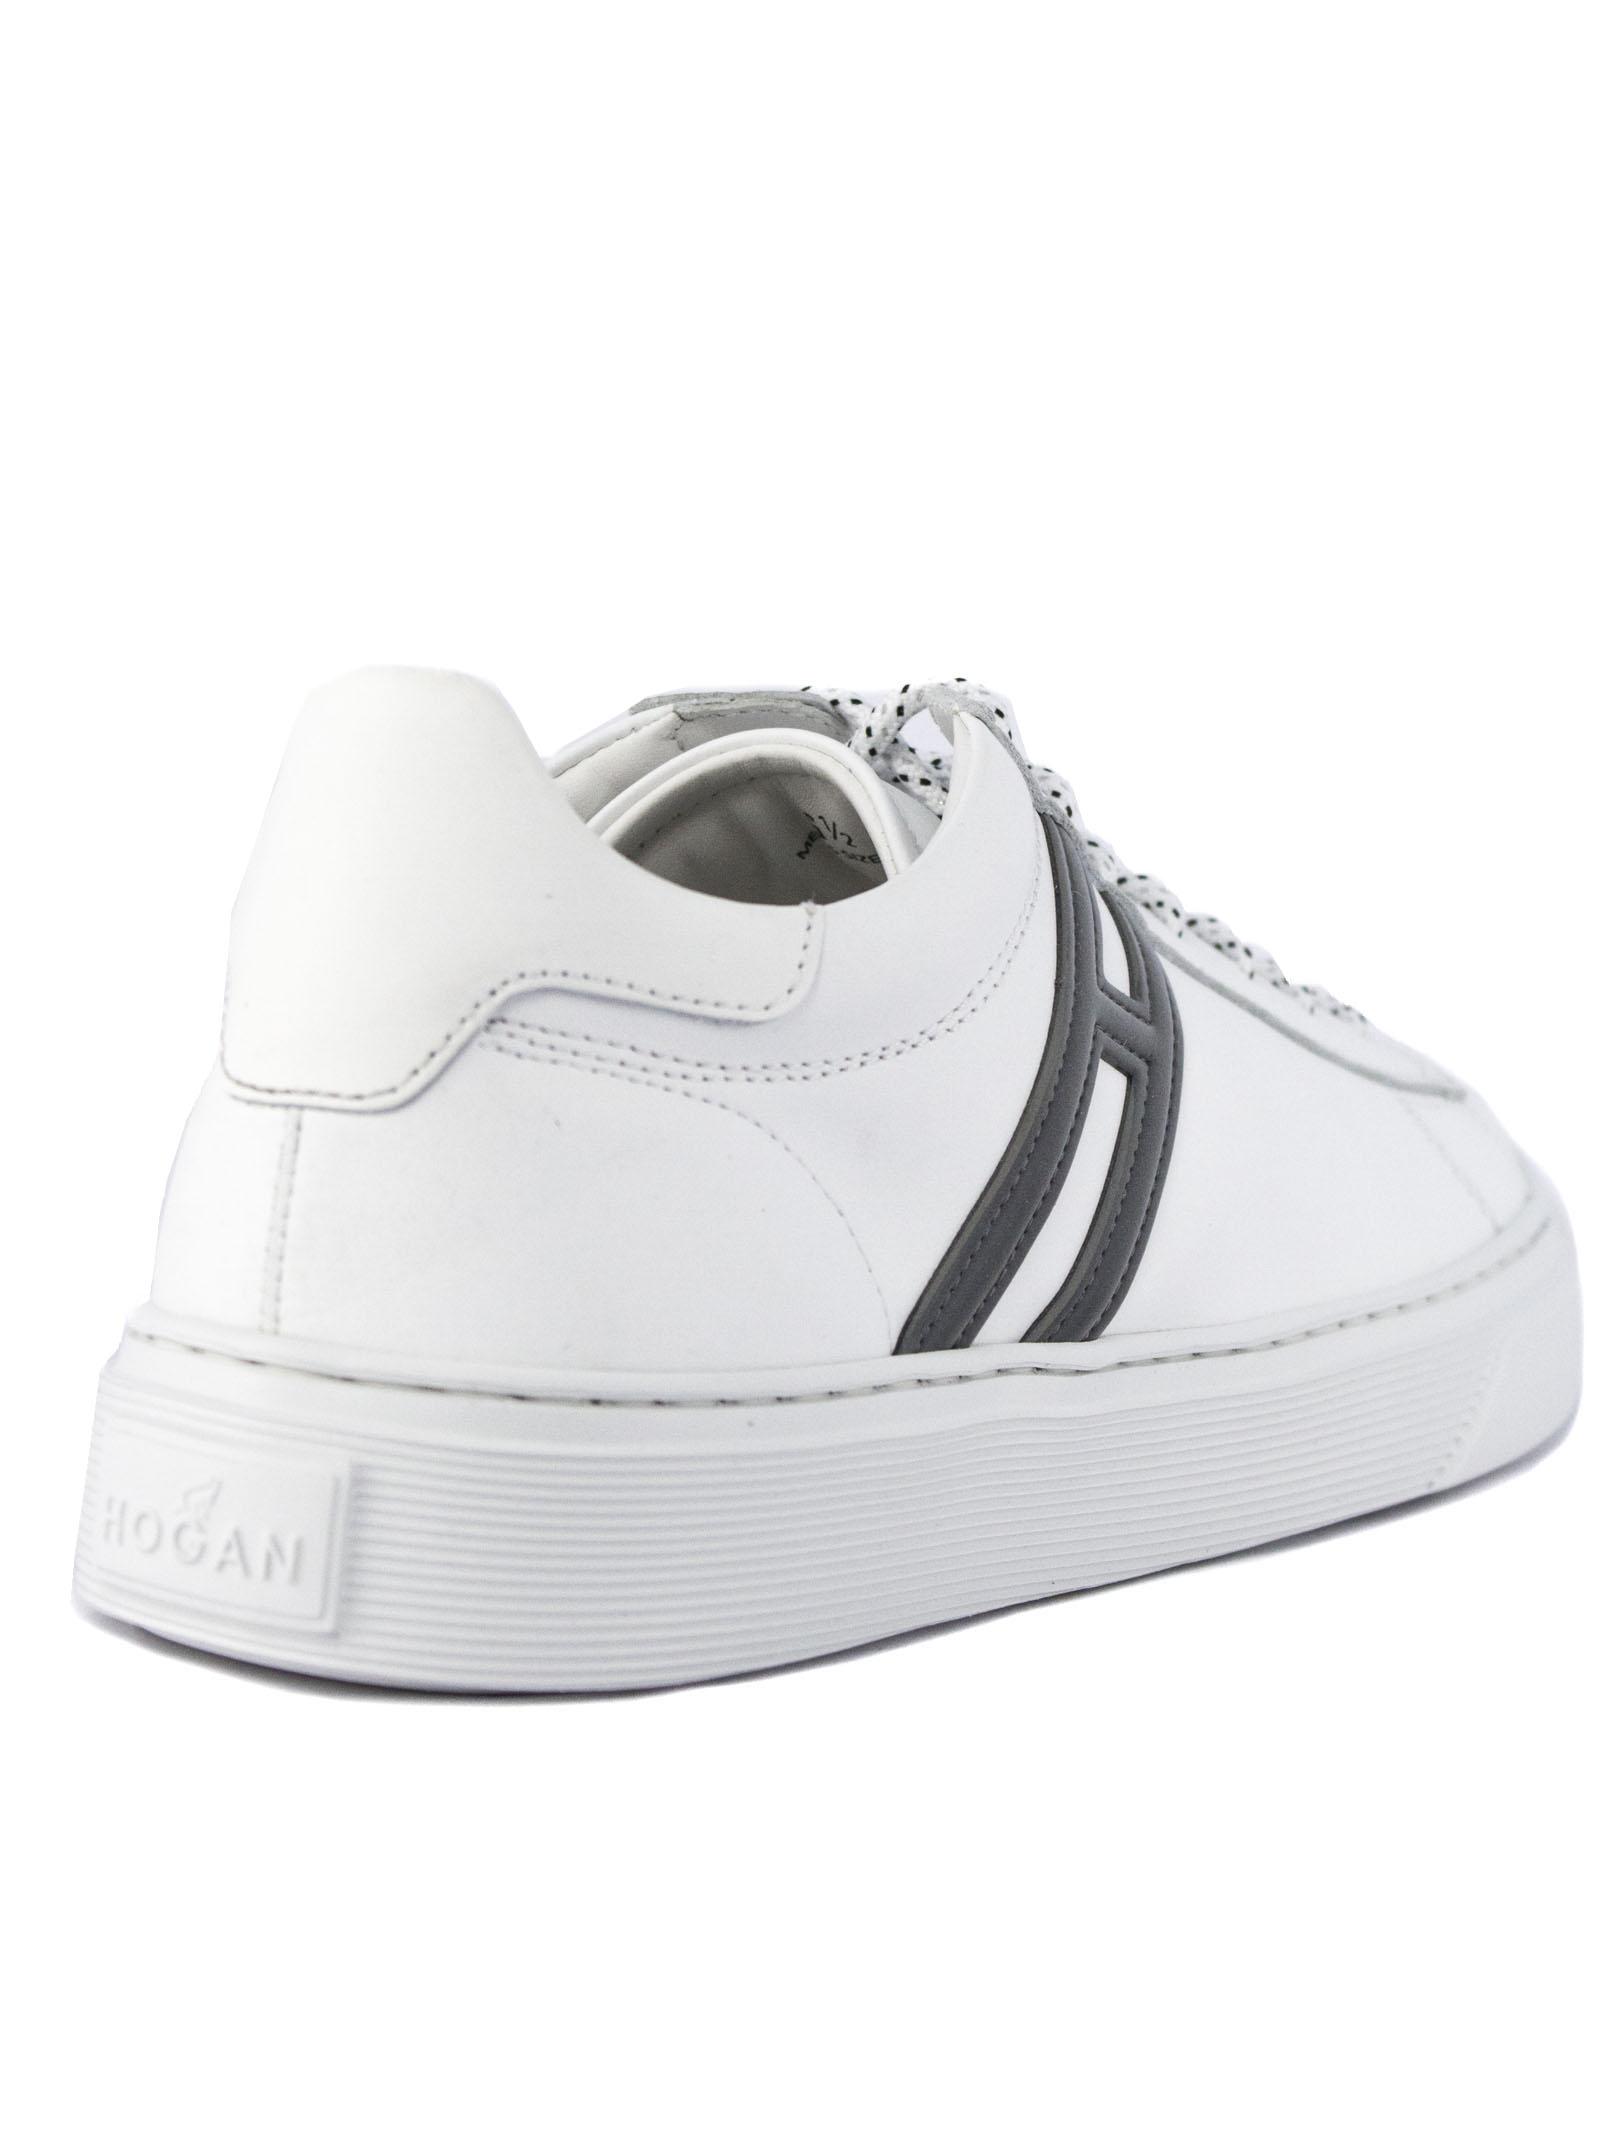 Sneakers H365 Hogan Uomo HXM3650J960KFMB001  19/21